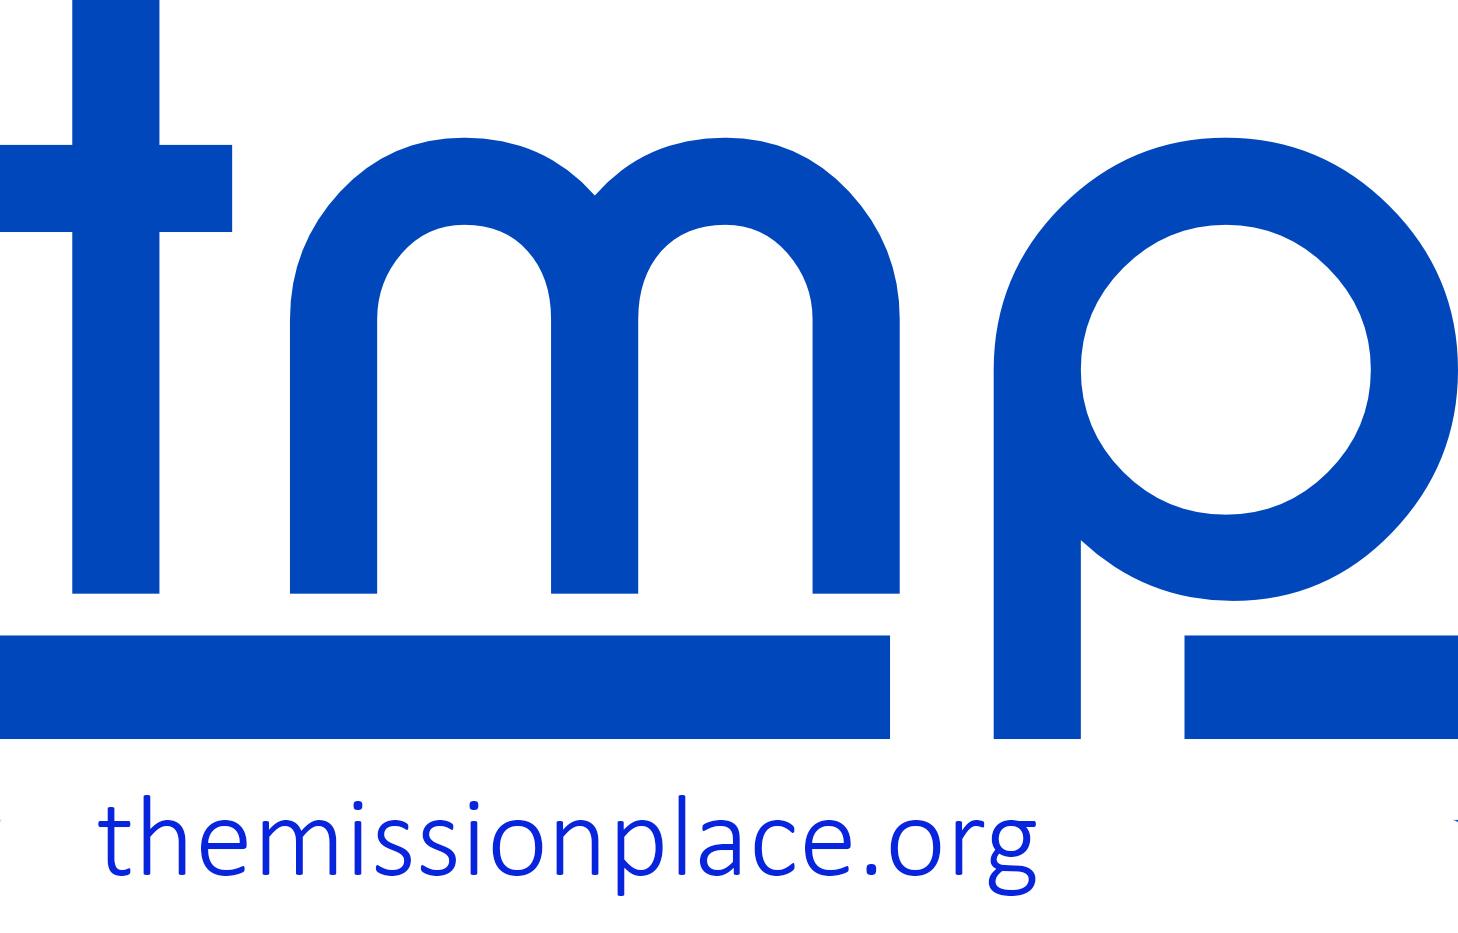 tmp_fixed_jpg_logo_high_resolution_domainname.jpg